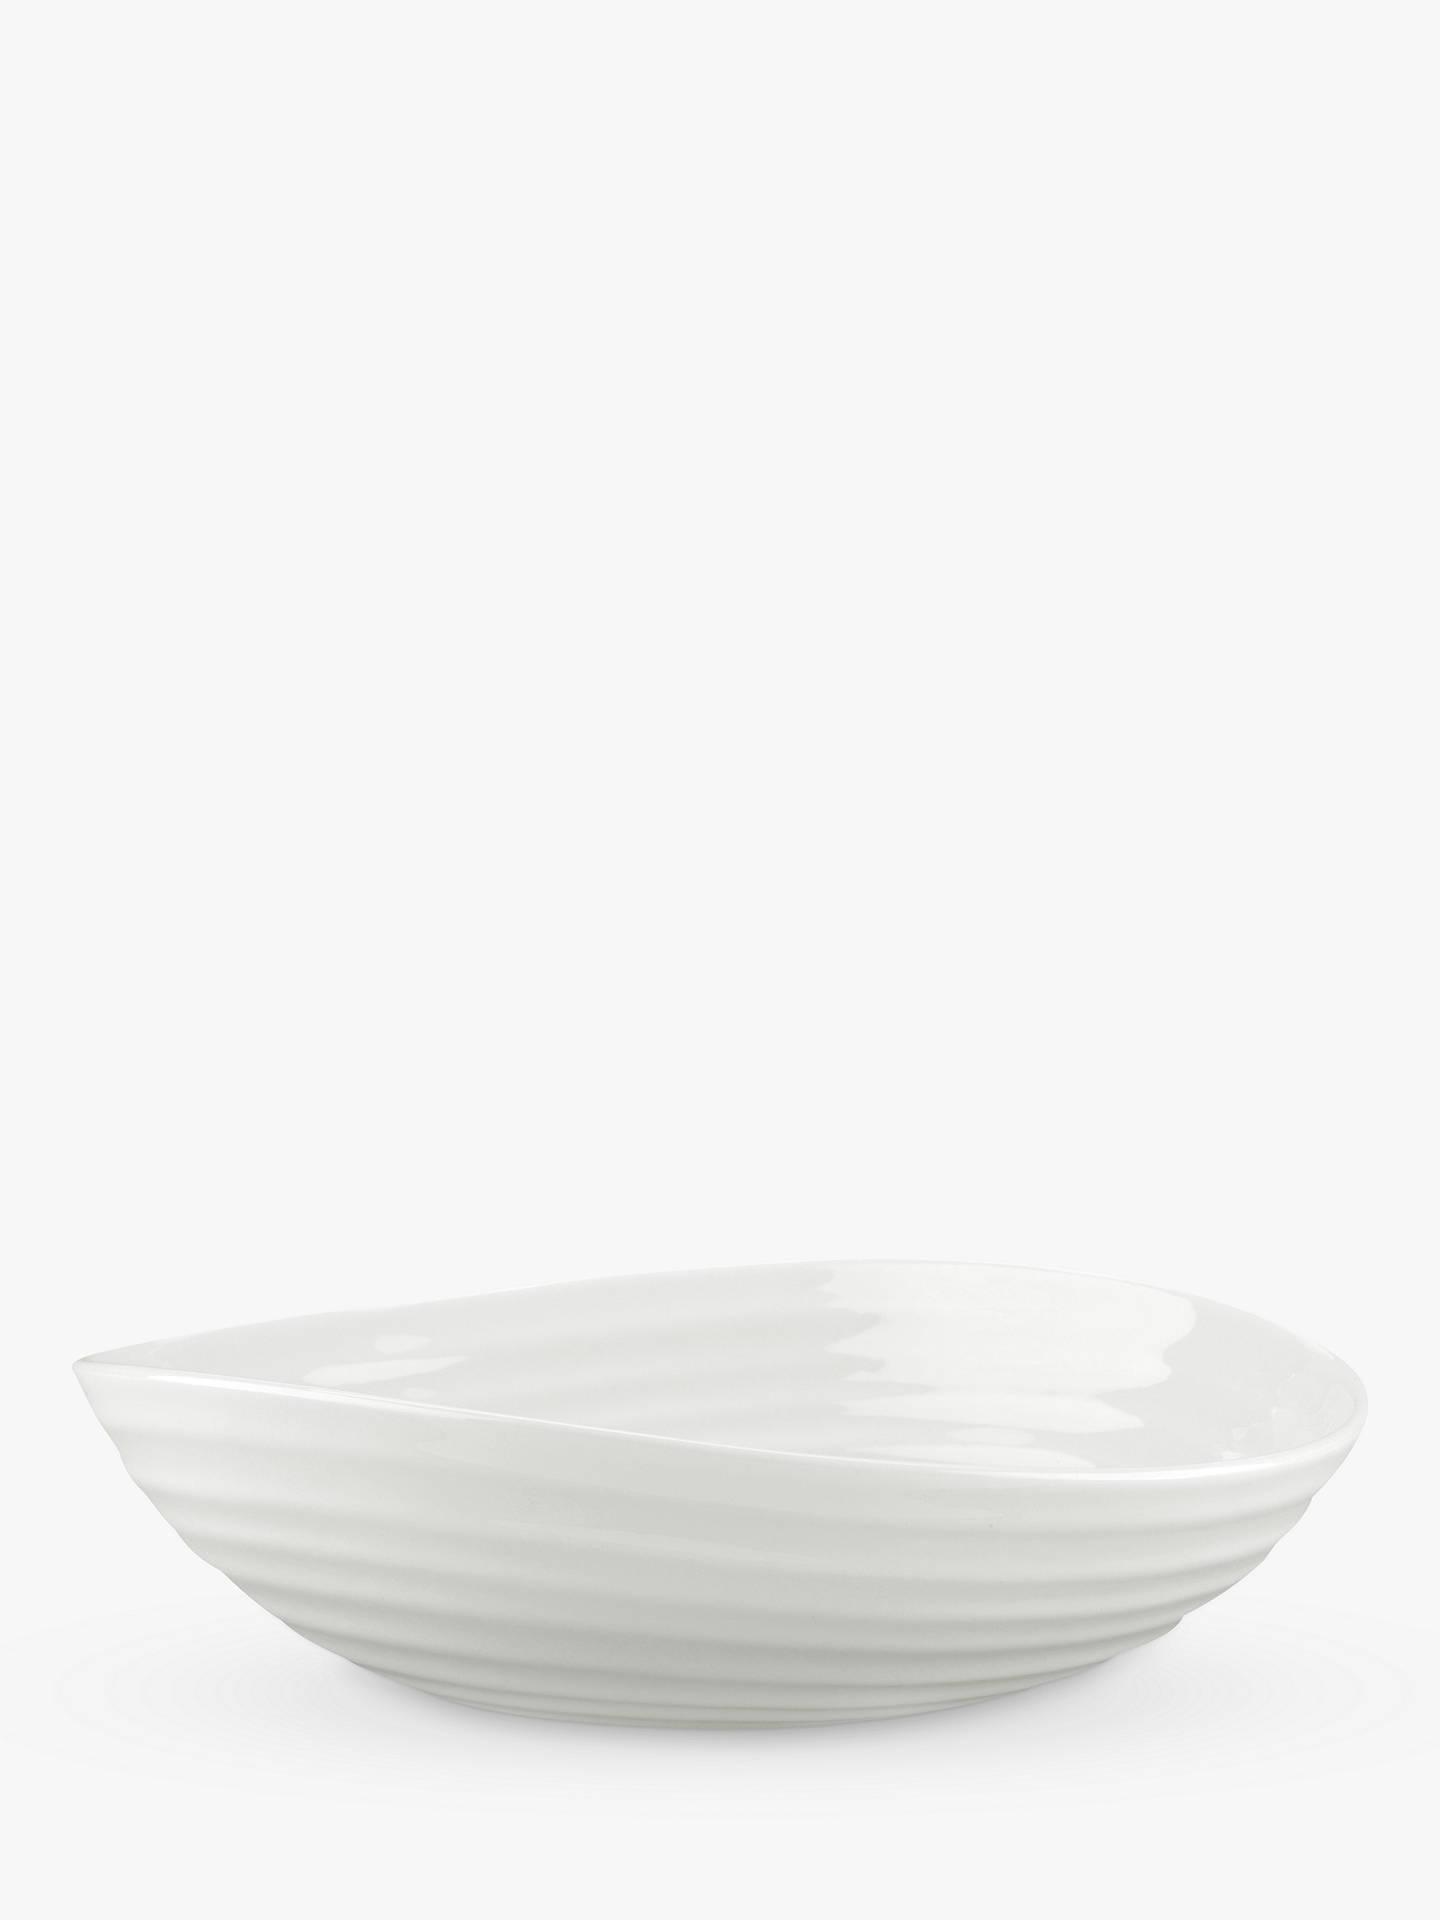 Portmeirion Sophie Conran Pasta Serving Bowl